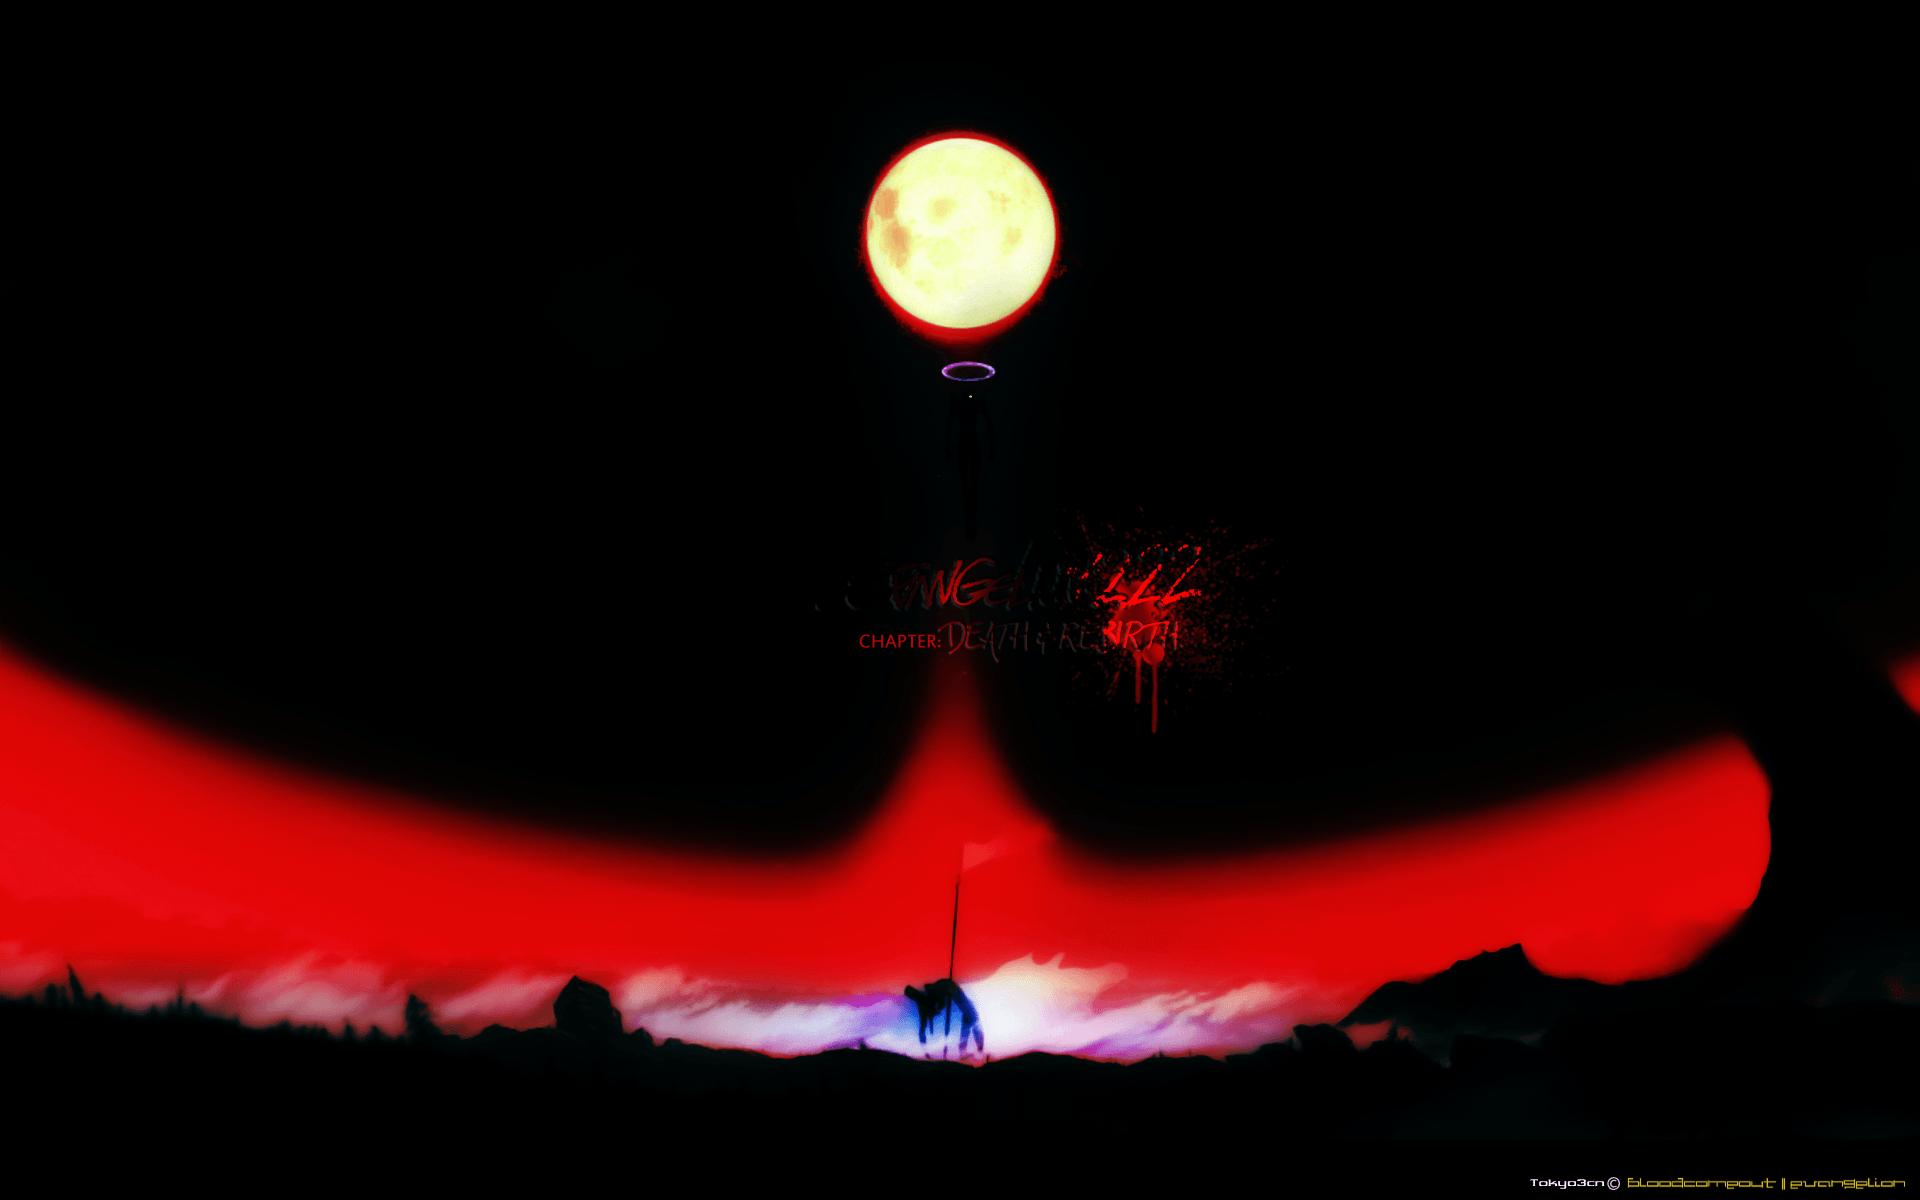 evangelion wallpaper hd anime - photo #17